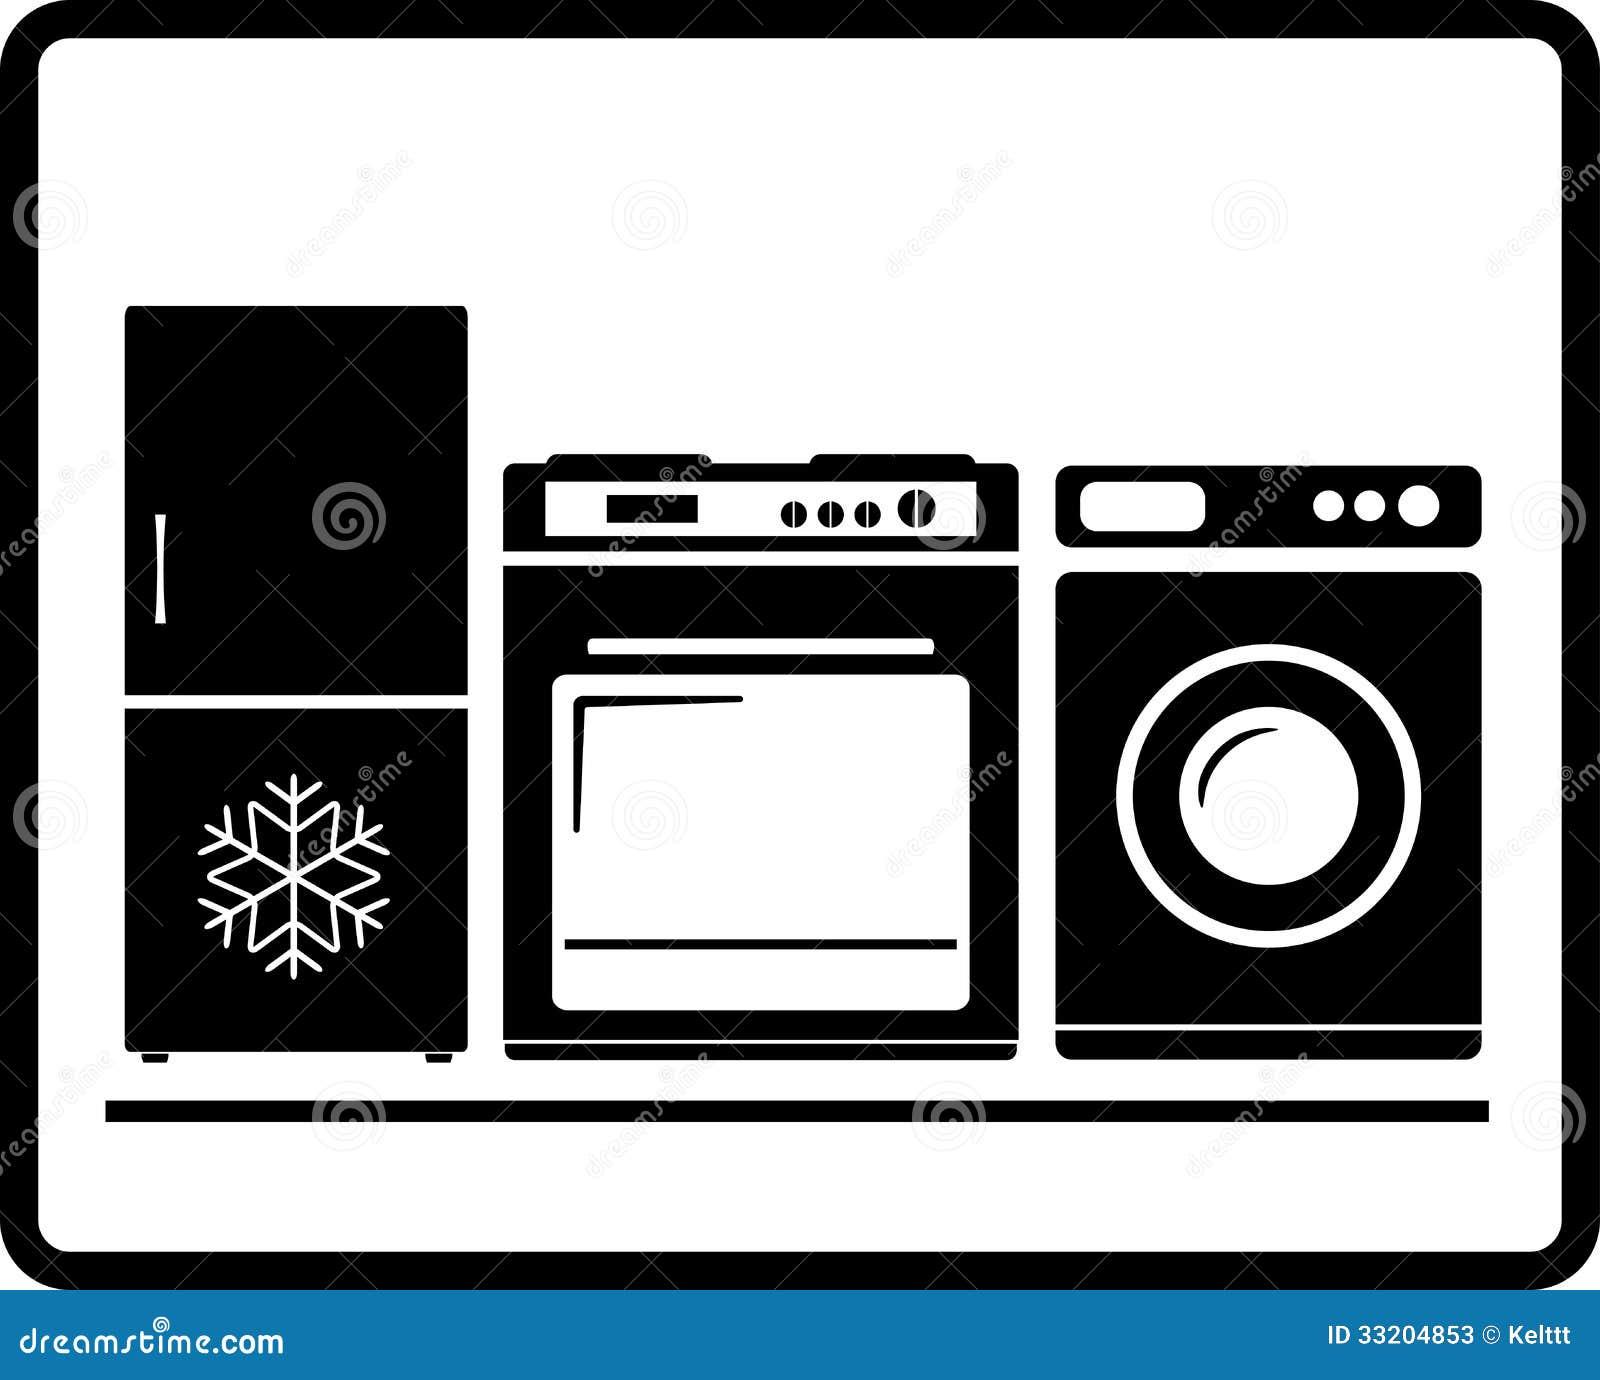 Household Appliances Gas Stove Refrigerator Wa Stock